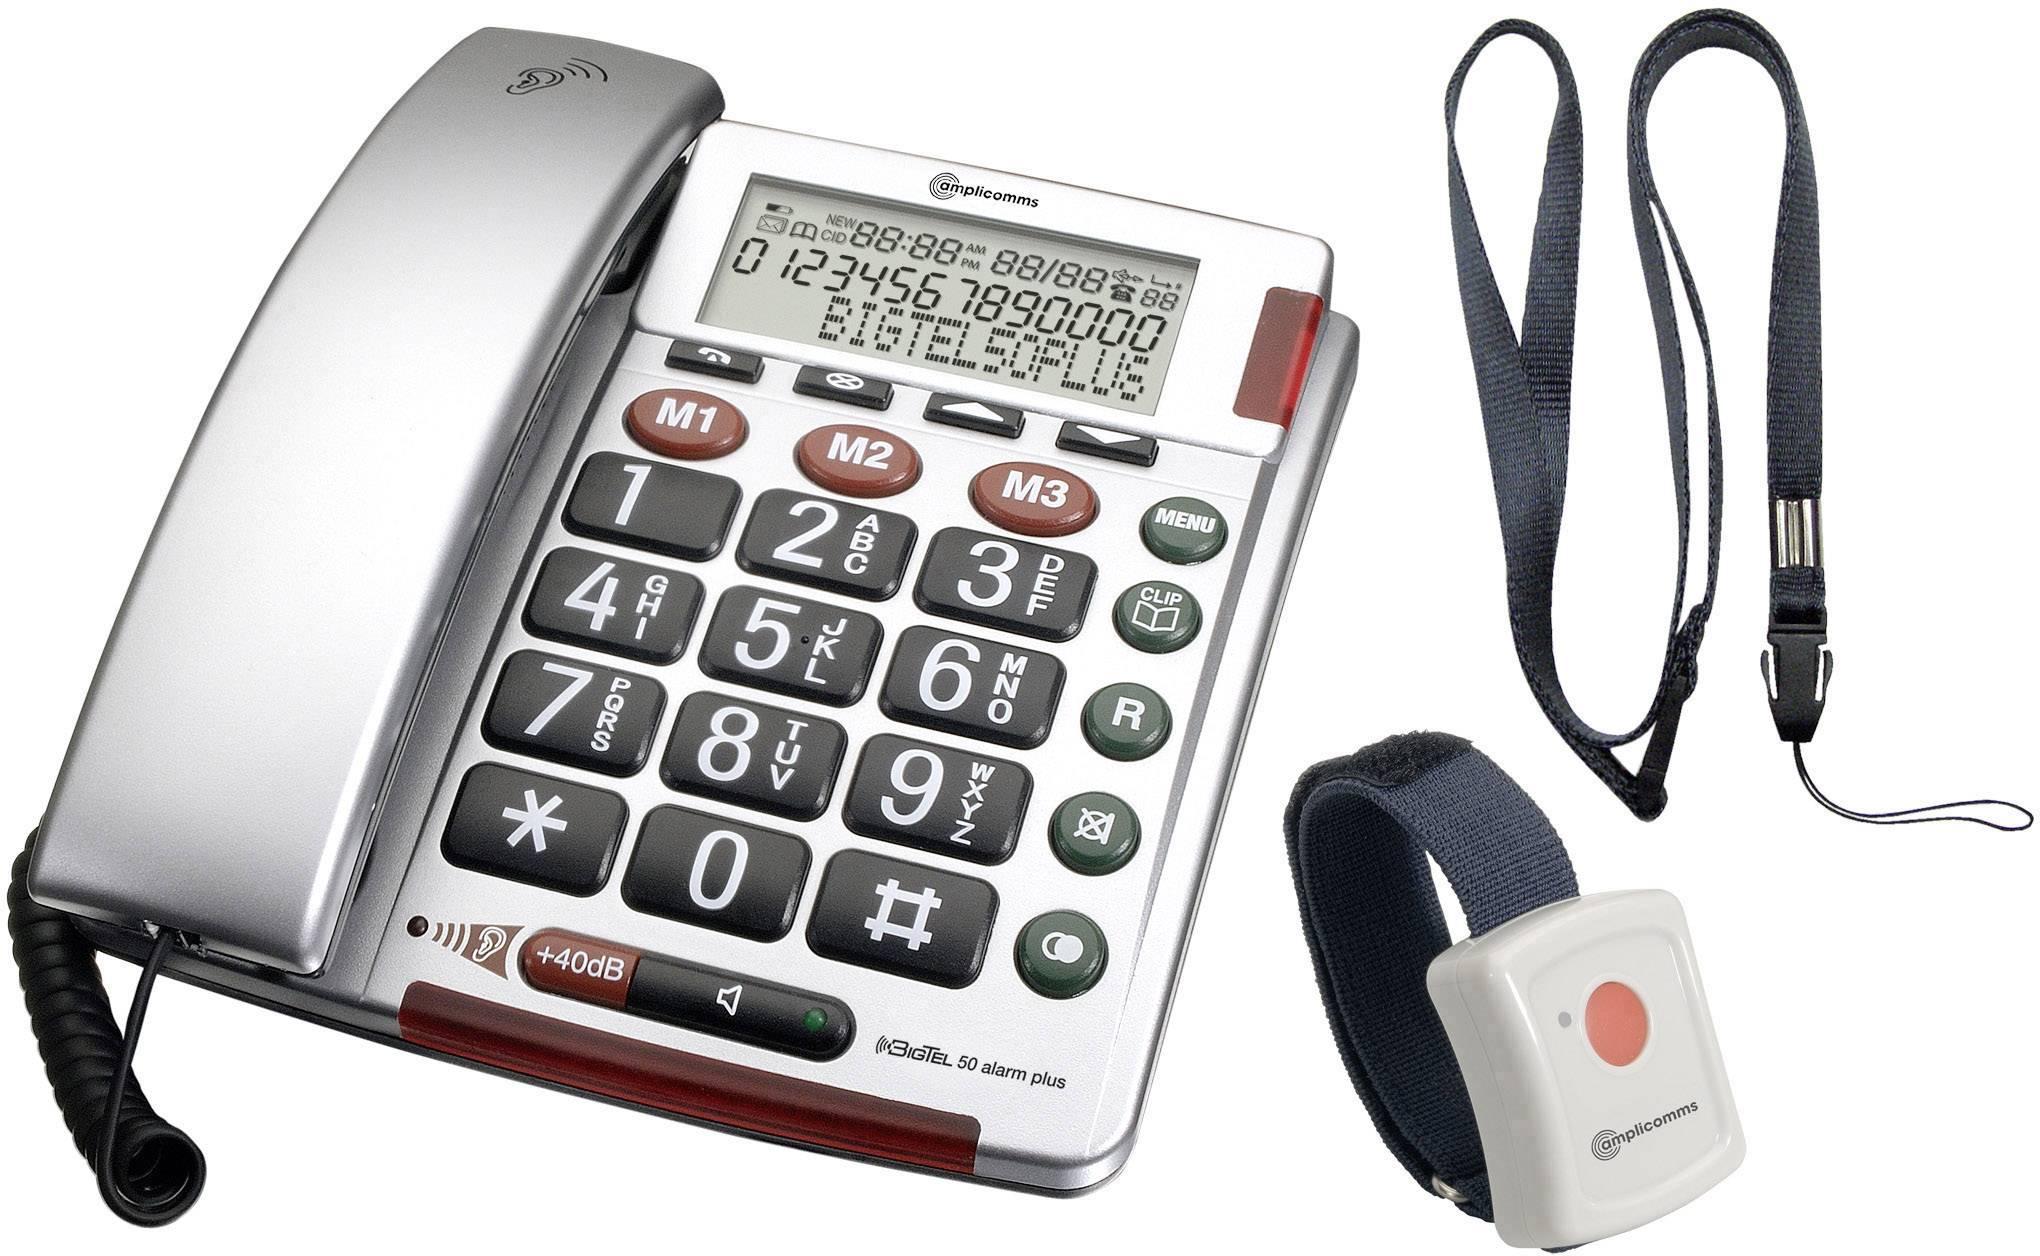 TELEFÓN AUDIOLINE BIGTEL 50 ALARM PLUS